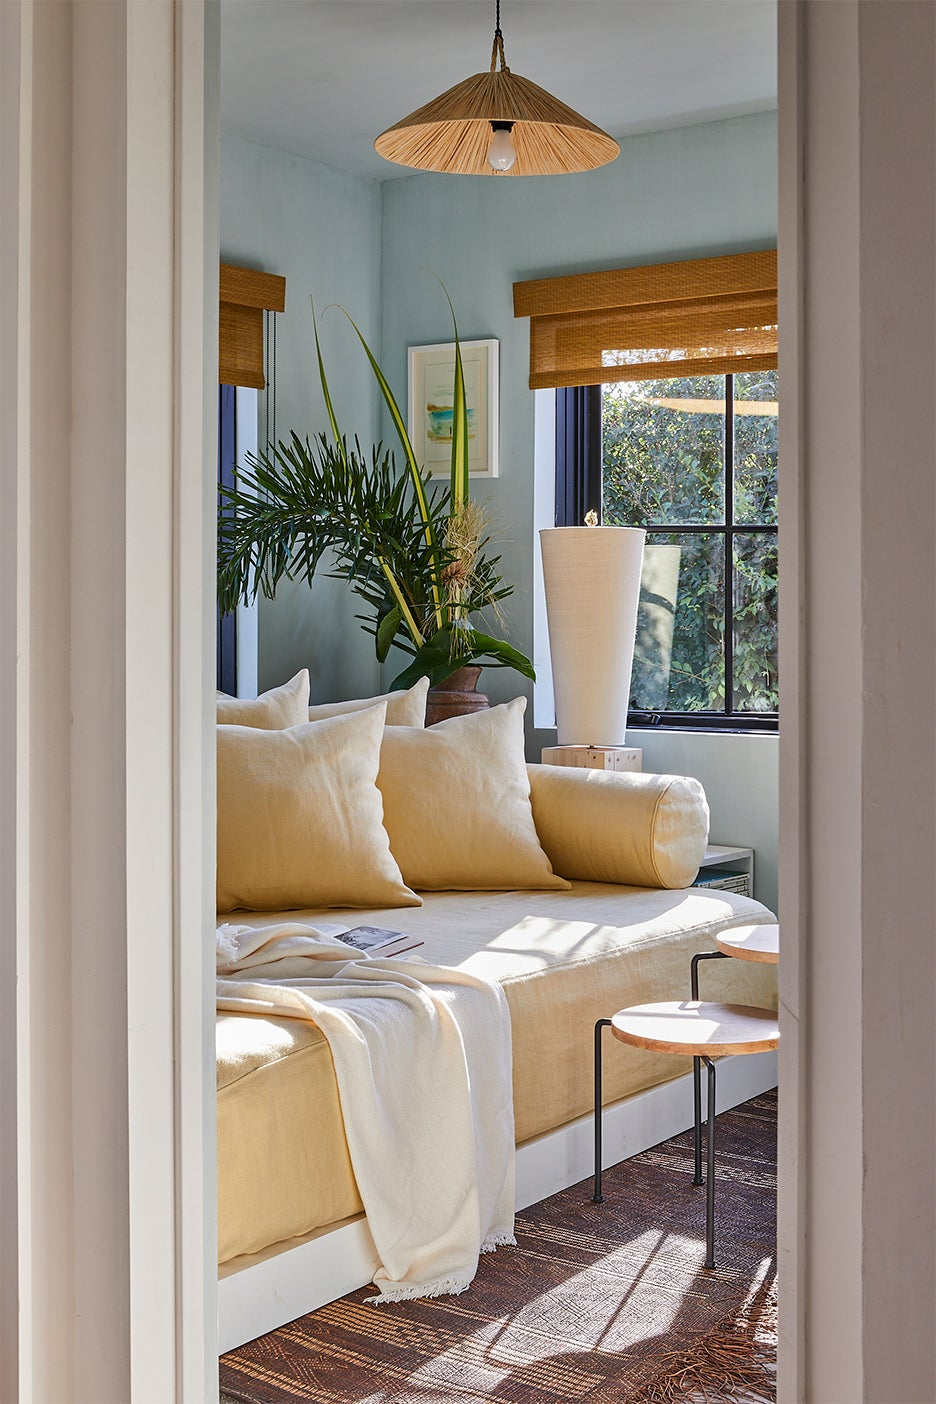 Woven raffia window shade